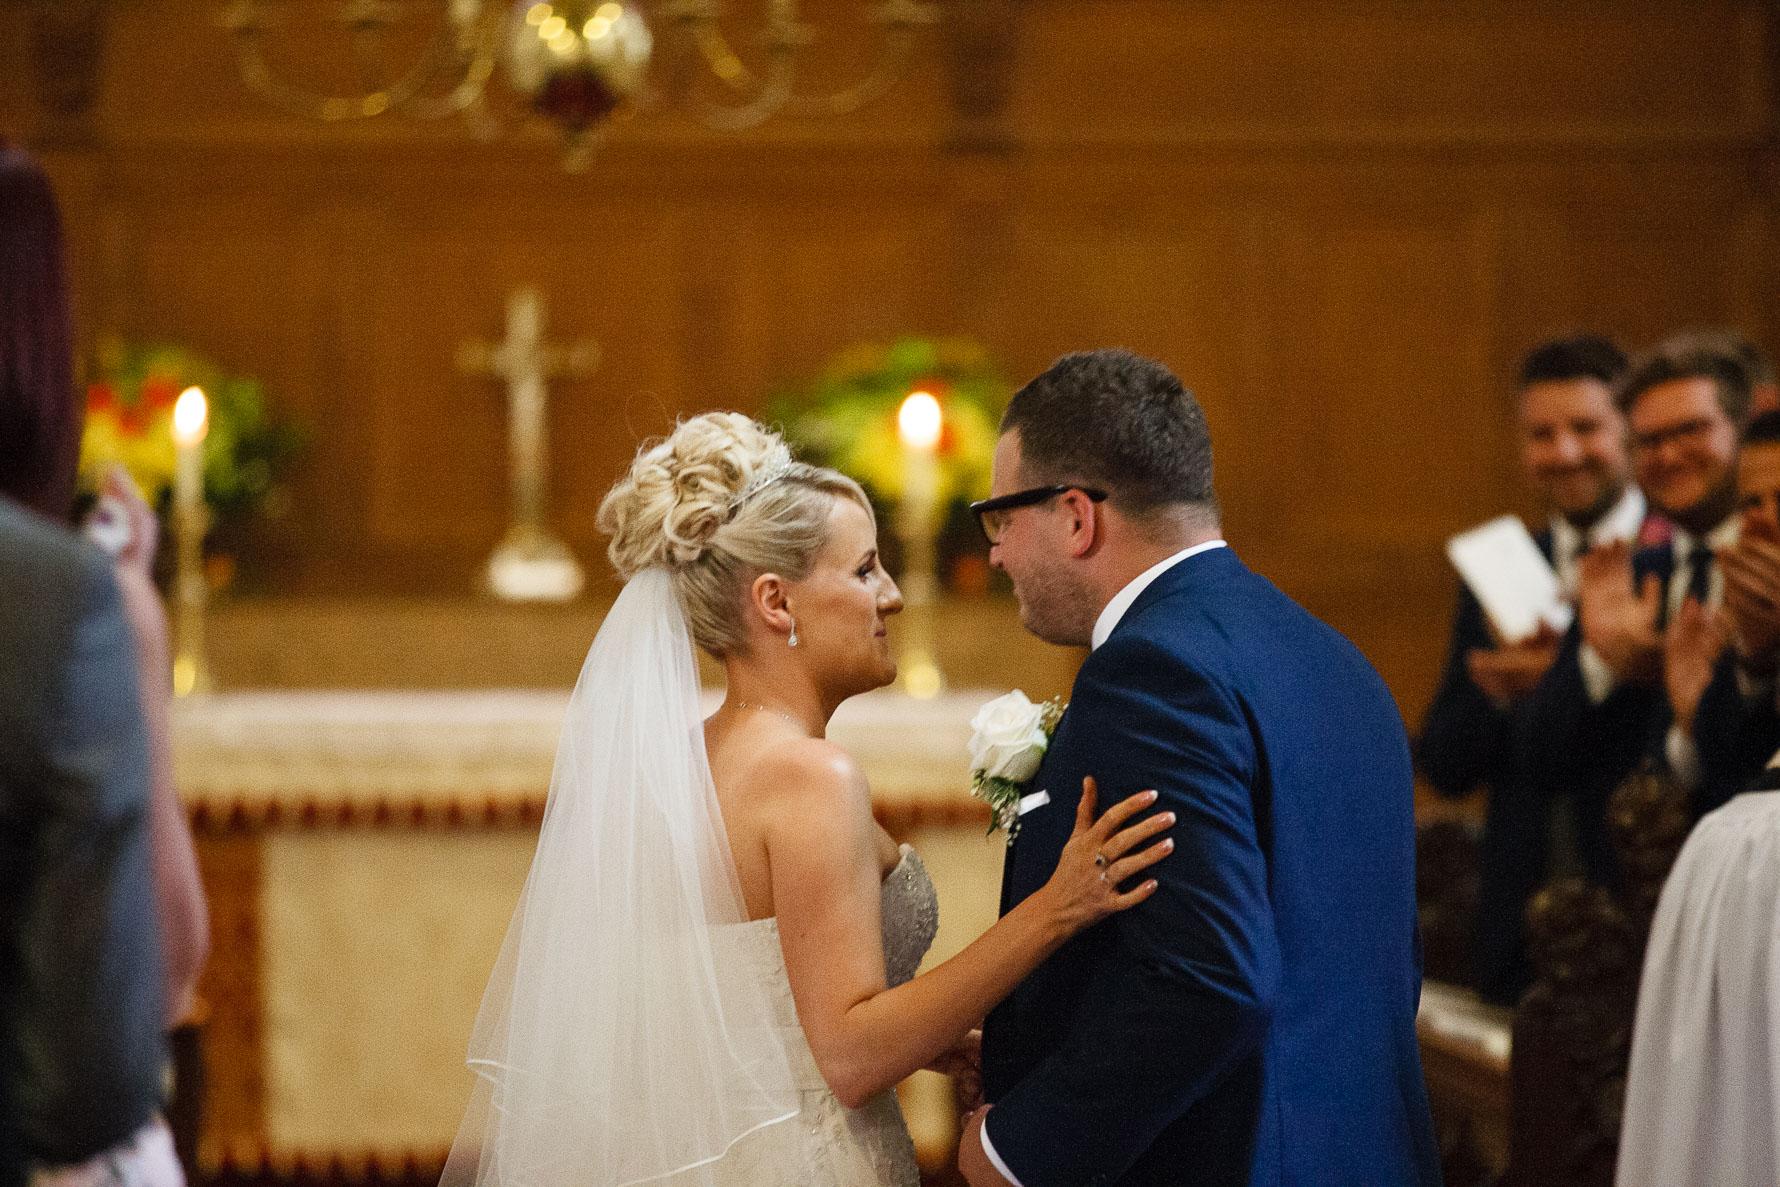 Canterbury Cathedral Lodge Wedding30-20141004 0477